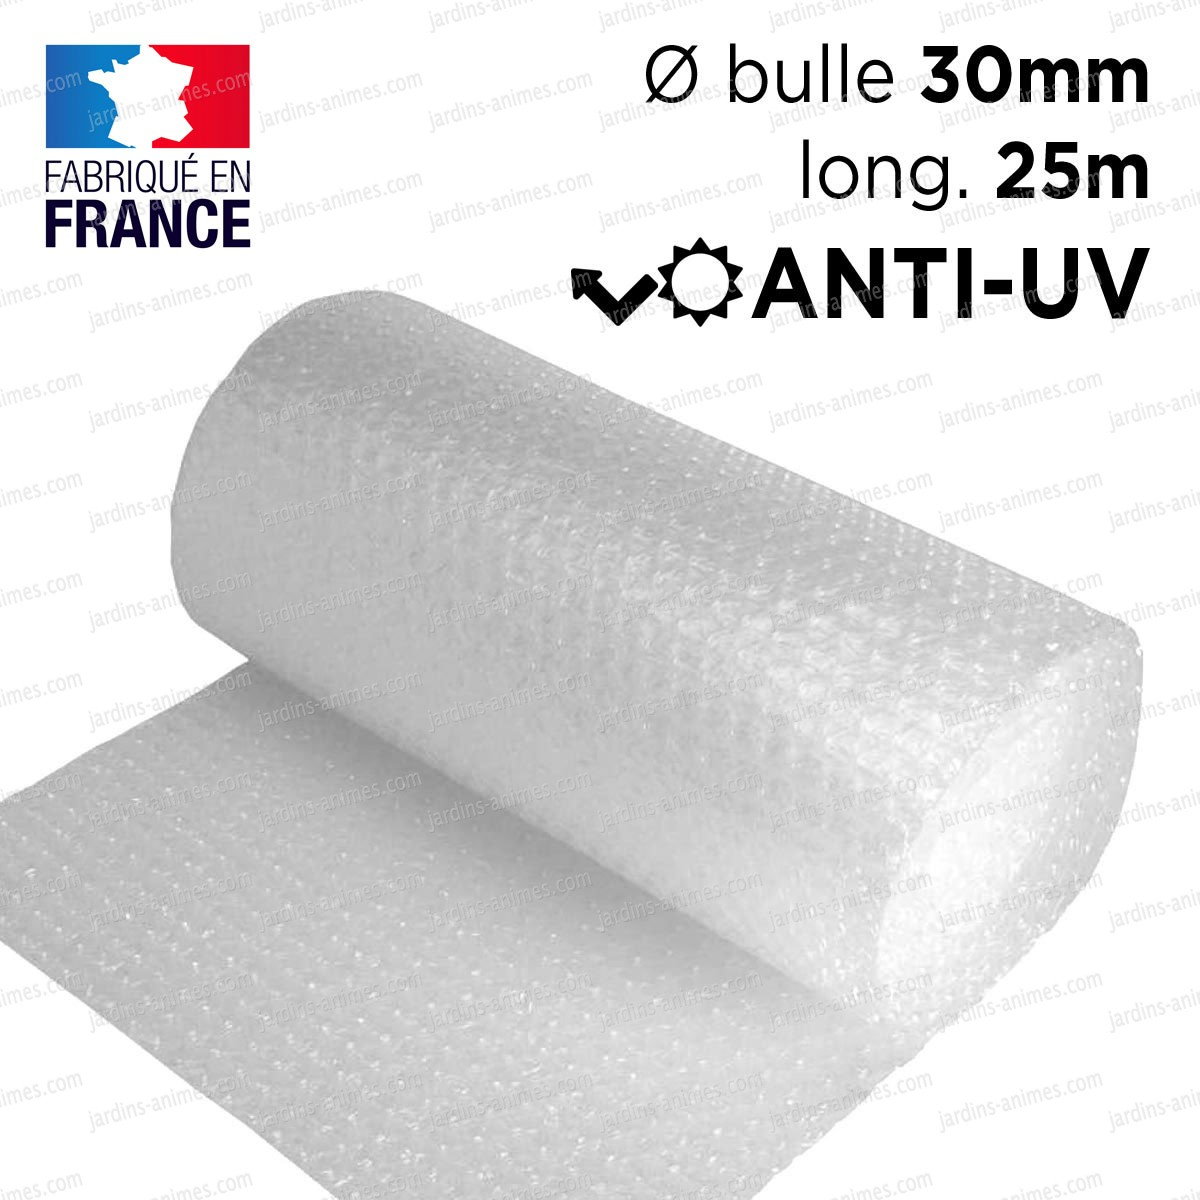 Film bulle 30mm anti uv 3 couches dim x 25m serre for Film plastique anti uv pour serre de jardin